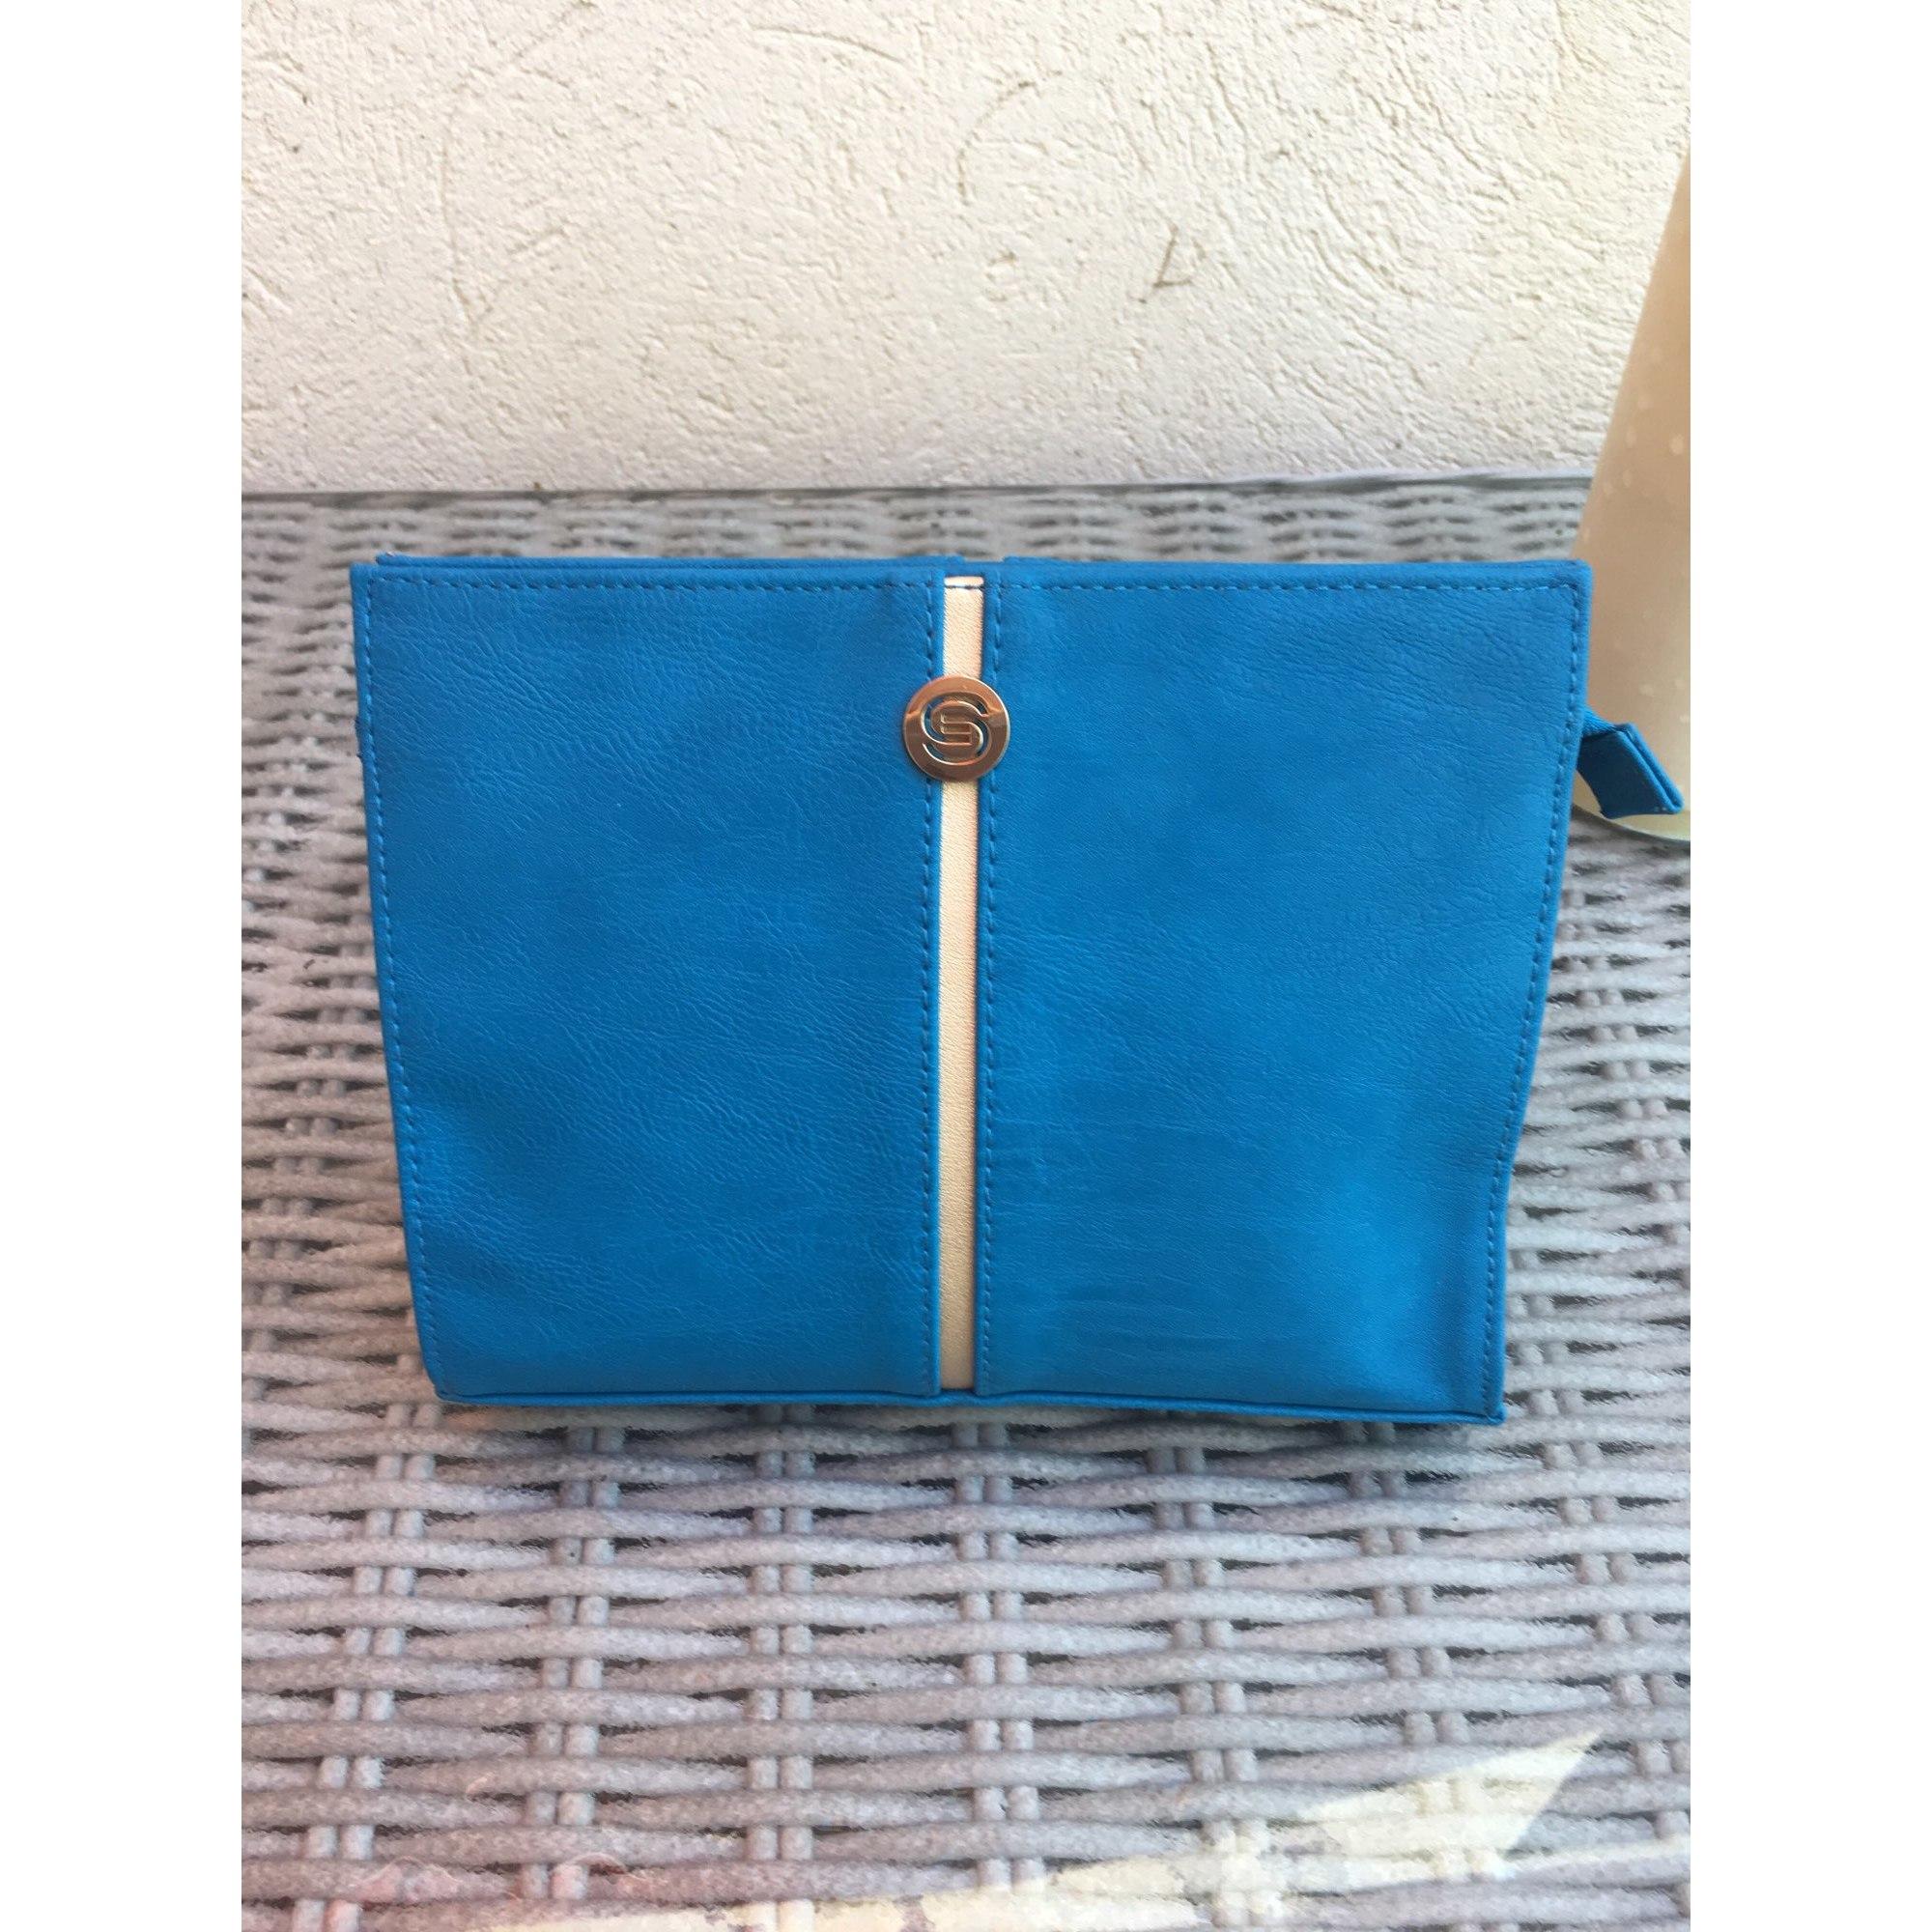 Pochette ELIE SAAB synthétique bleu